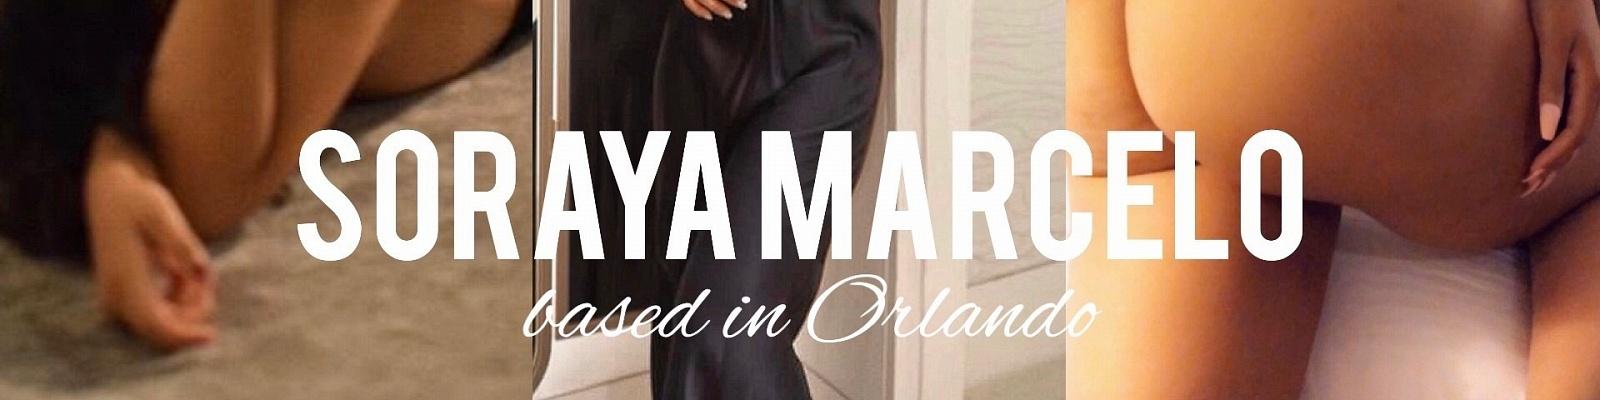 Soraya Marcelo's Cover Photo